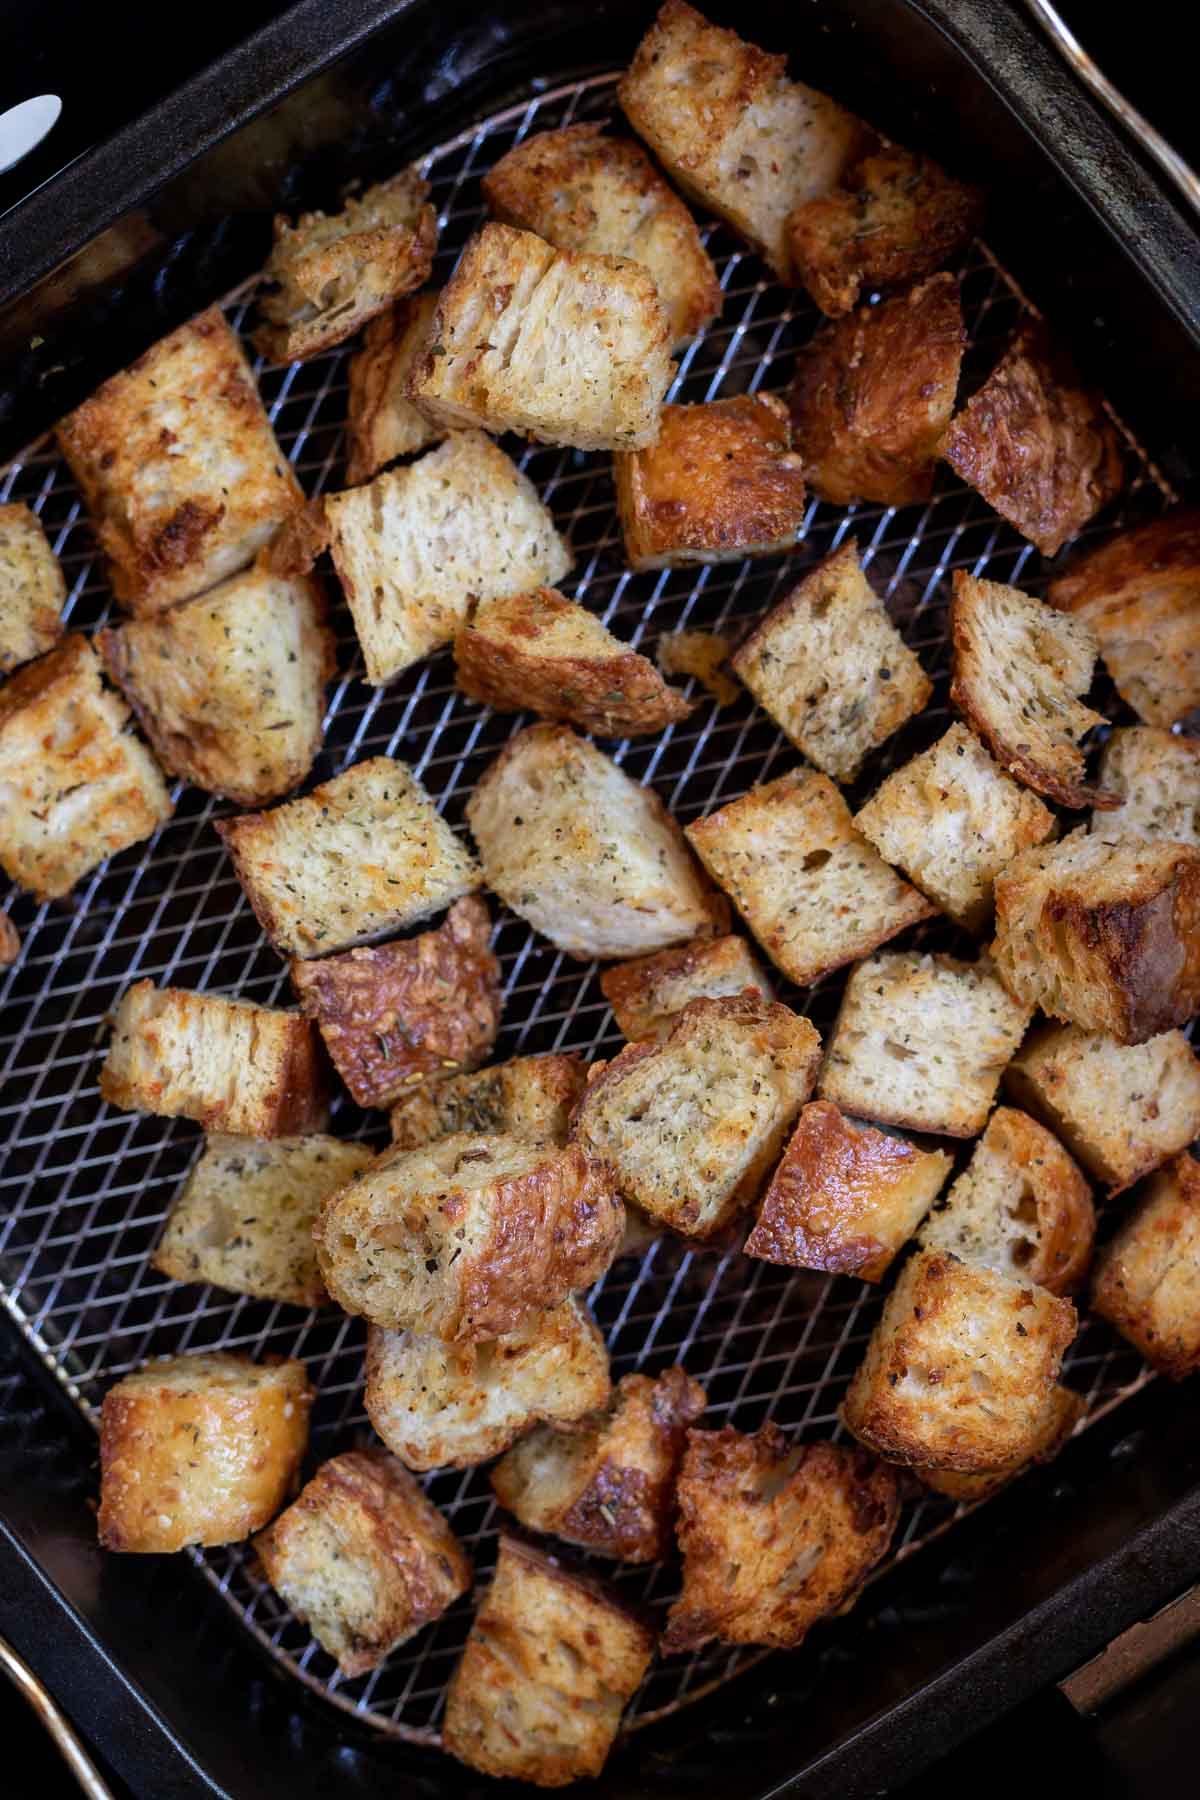 golden brown croutons in air fryer basket